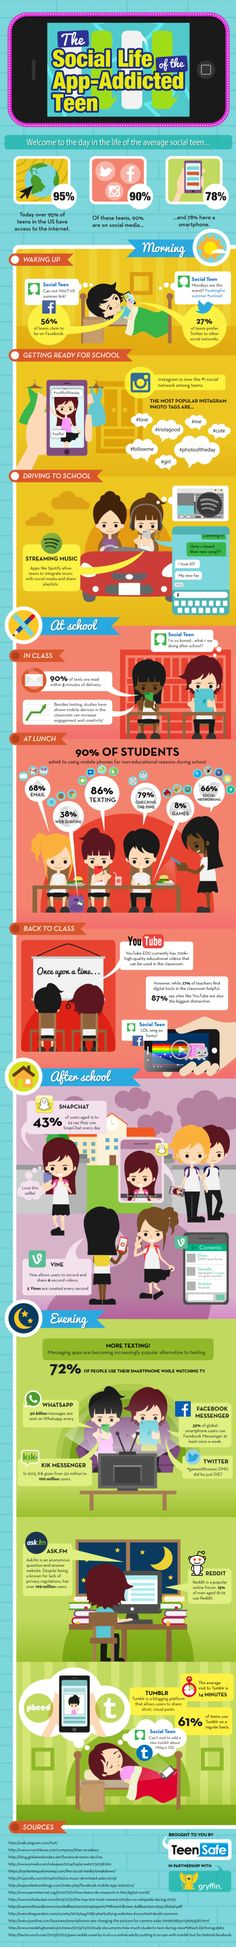 The Social Life of the App Addicted Teen   #Teen #SocialMedia #App #infographic